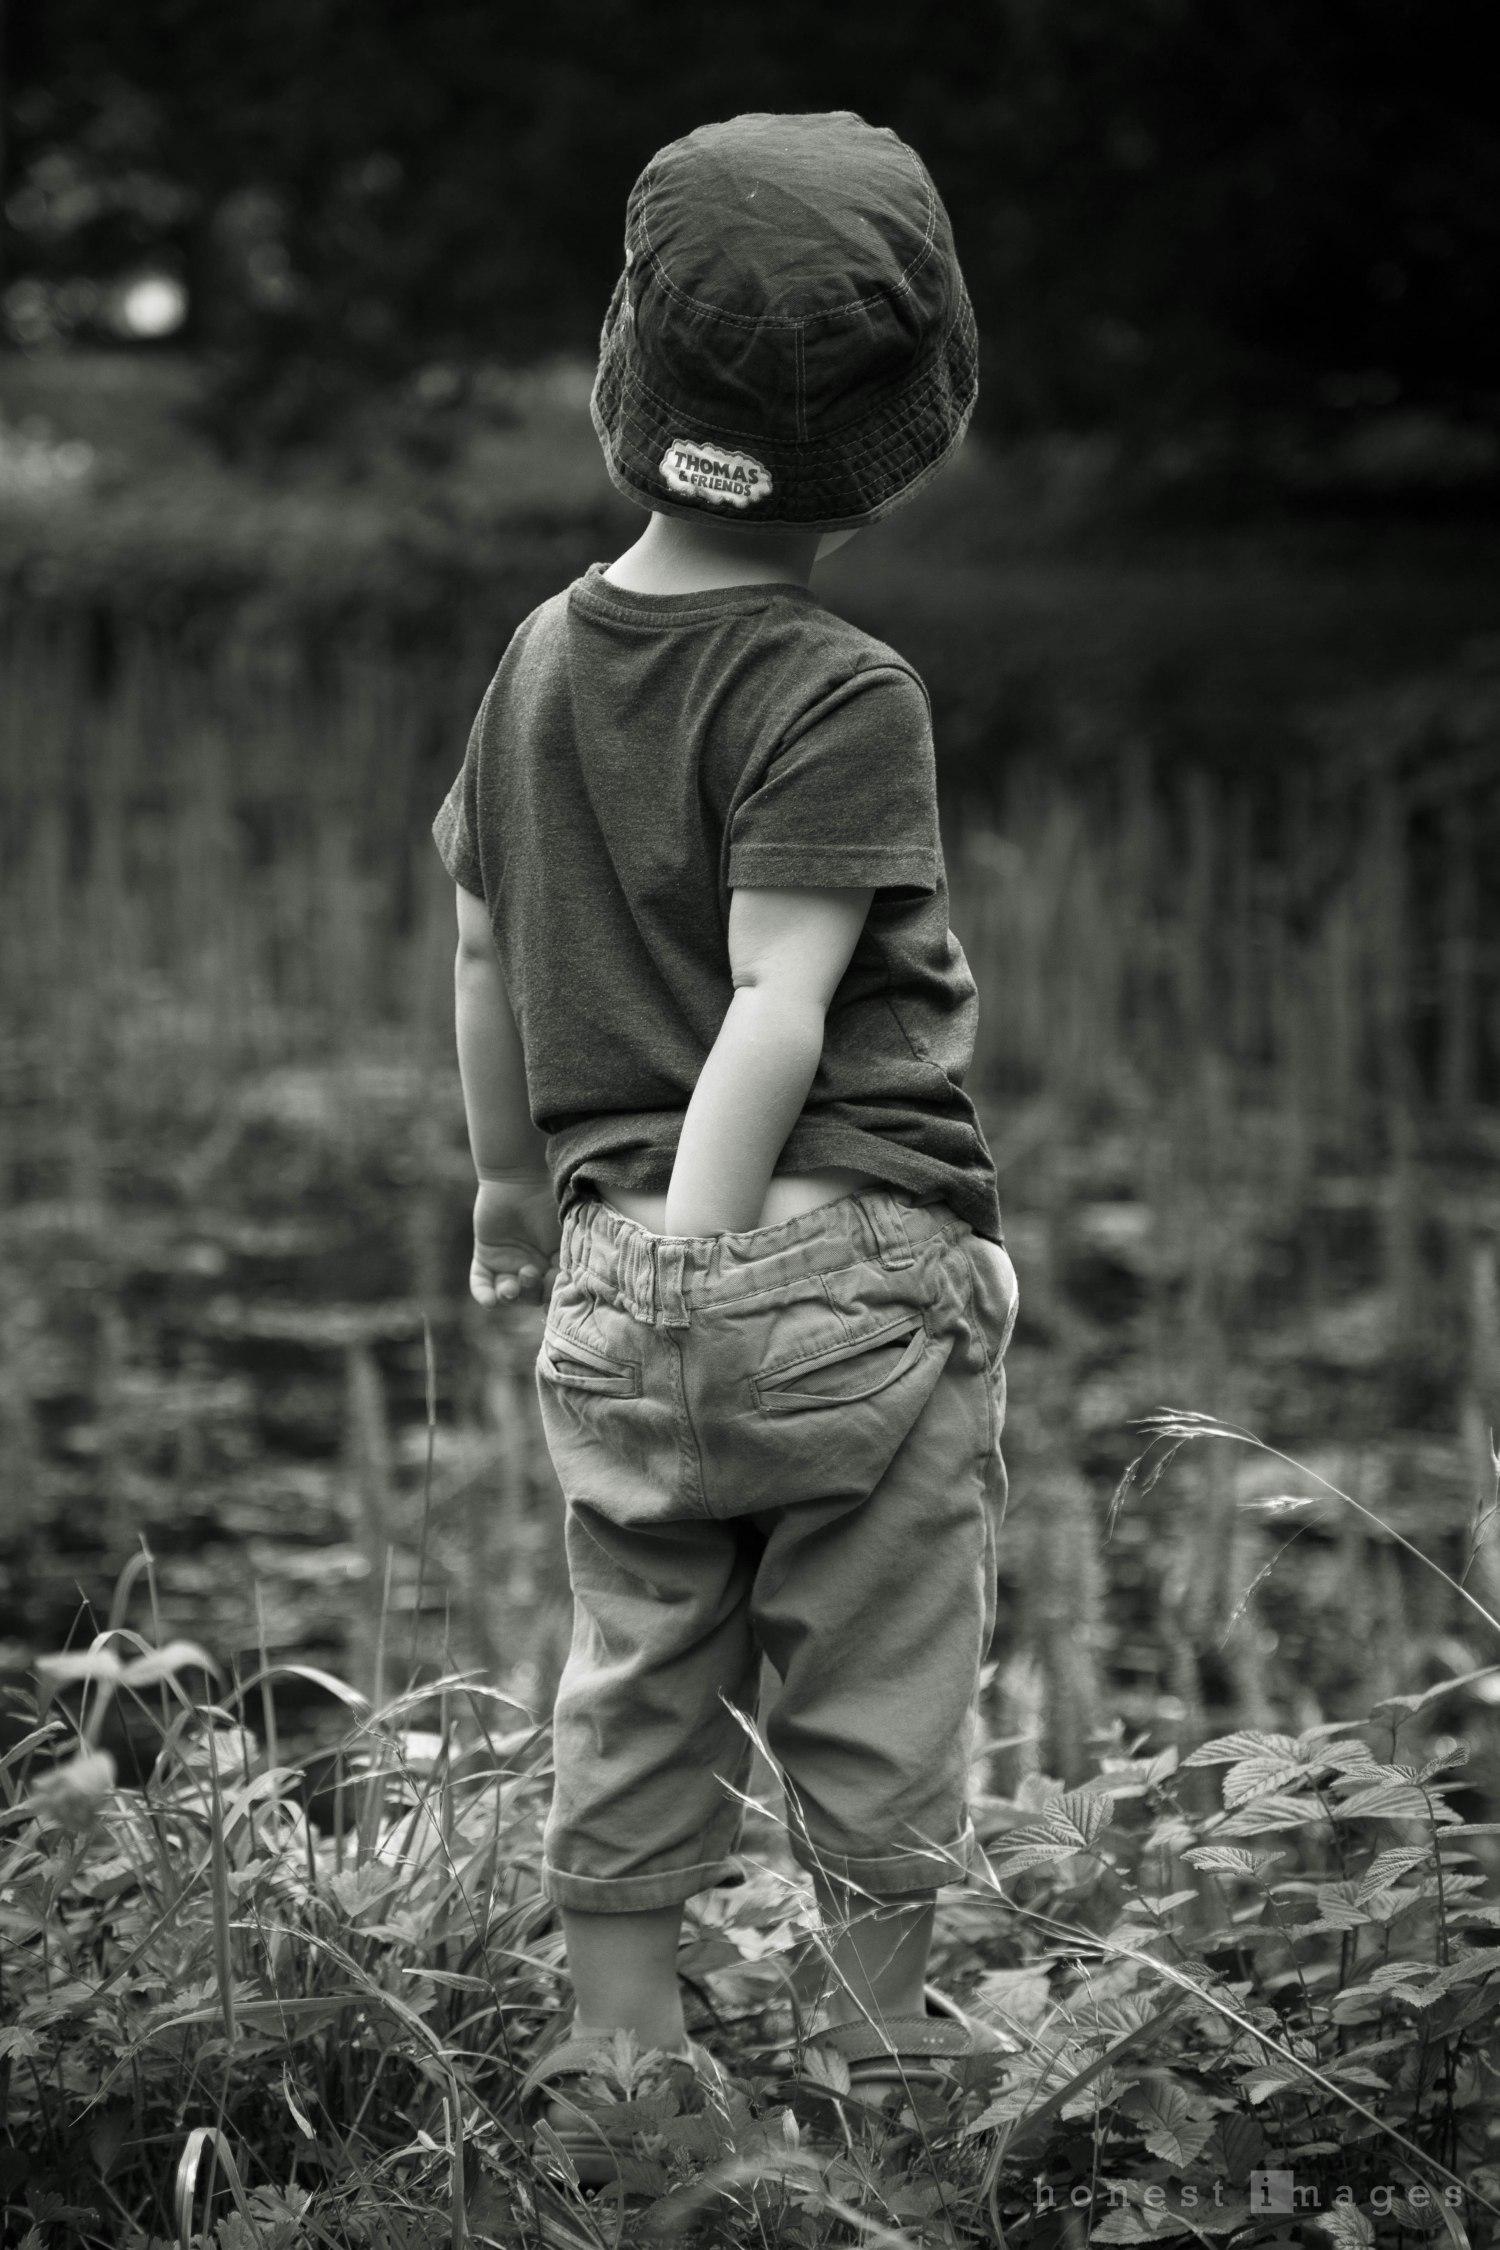 Ripon Photographer, Ripon Child Photography, Ripon Natural Light Photography, Ripon Child Photography, Ripon Child Portraits, Thorpe perrow Photography